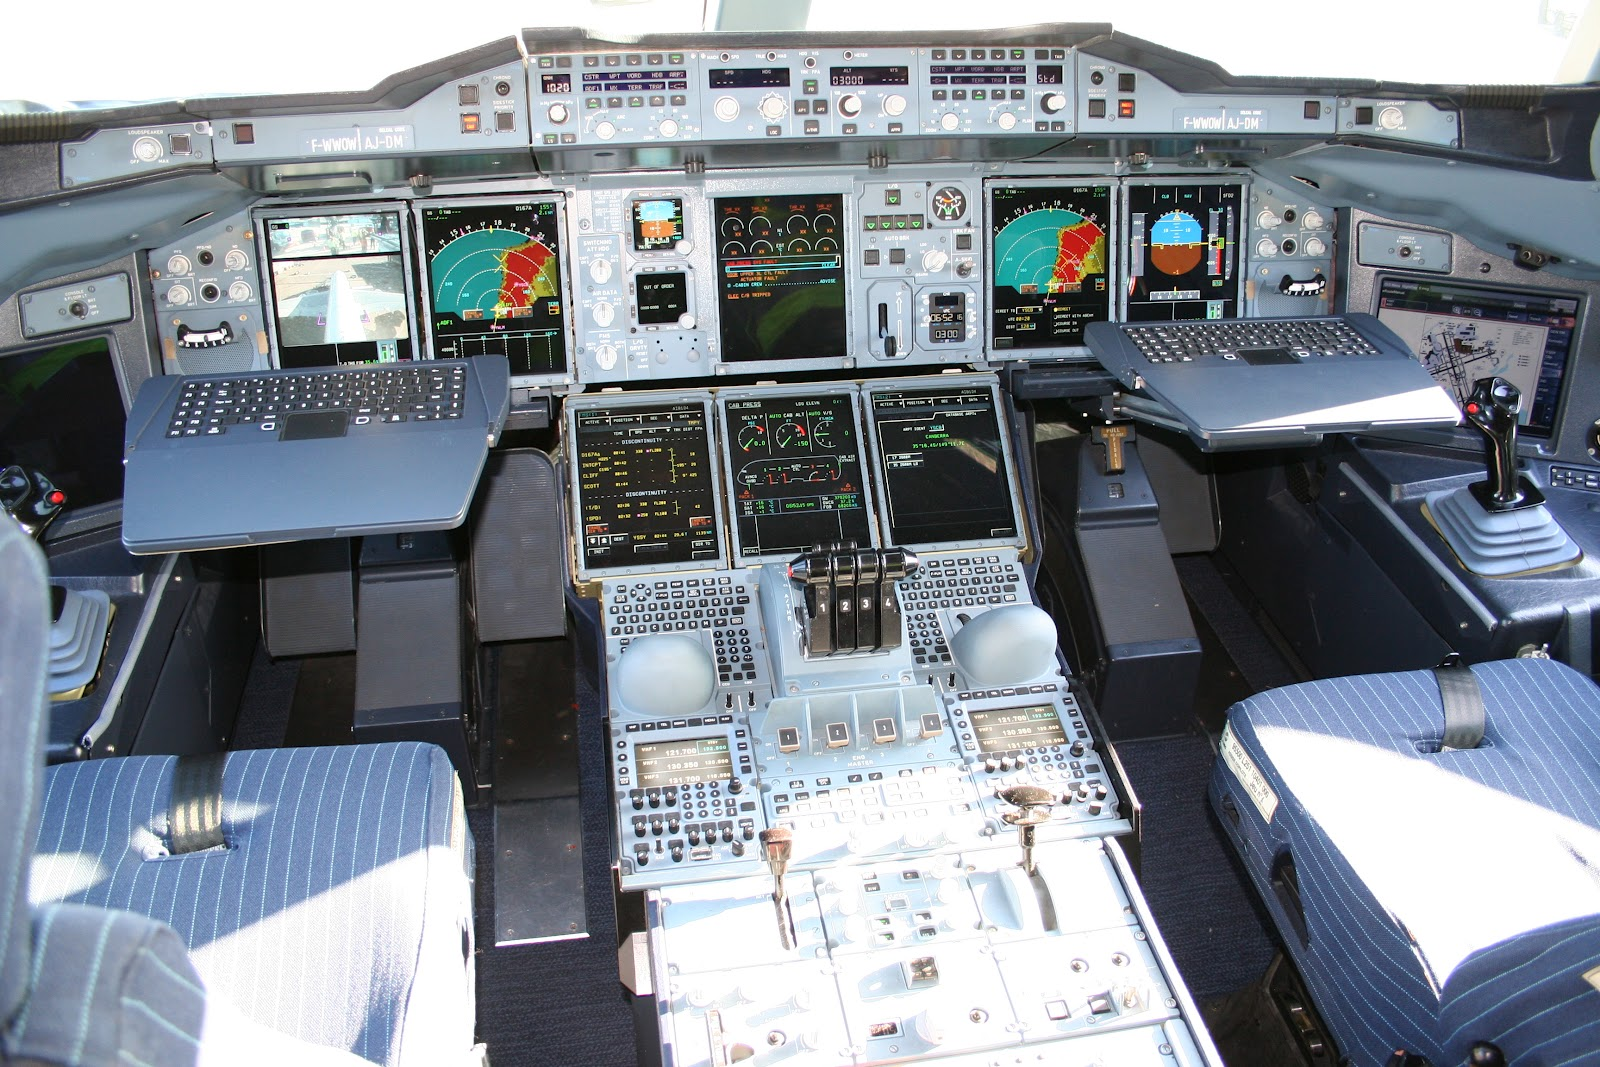 http://2.bp.blogspot.com/-jJogO2fQbf0/T3zYU6c2B0I/AAAAAAAAH1k/MbJMbj_HevE/s1600/a380_cockpit_look.jpg